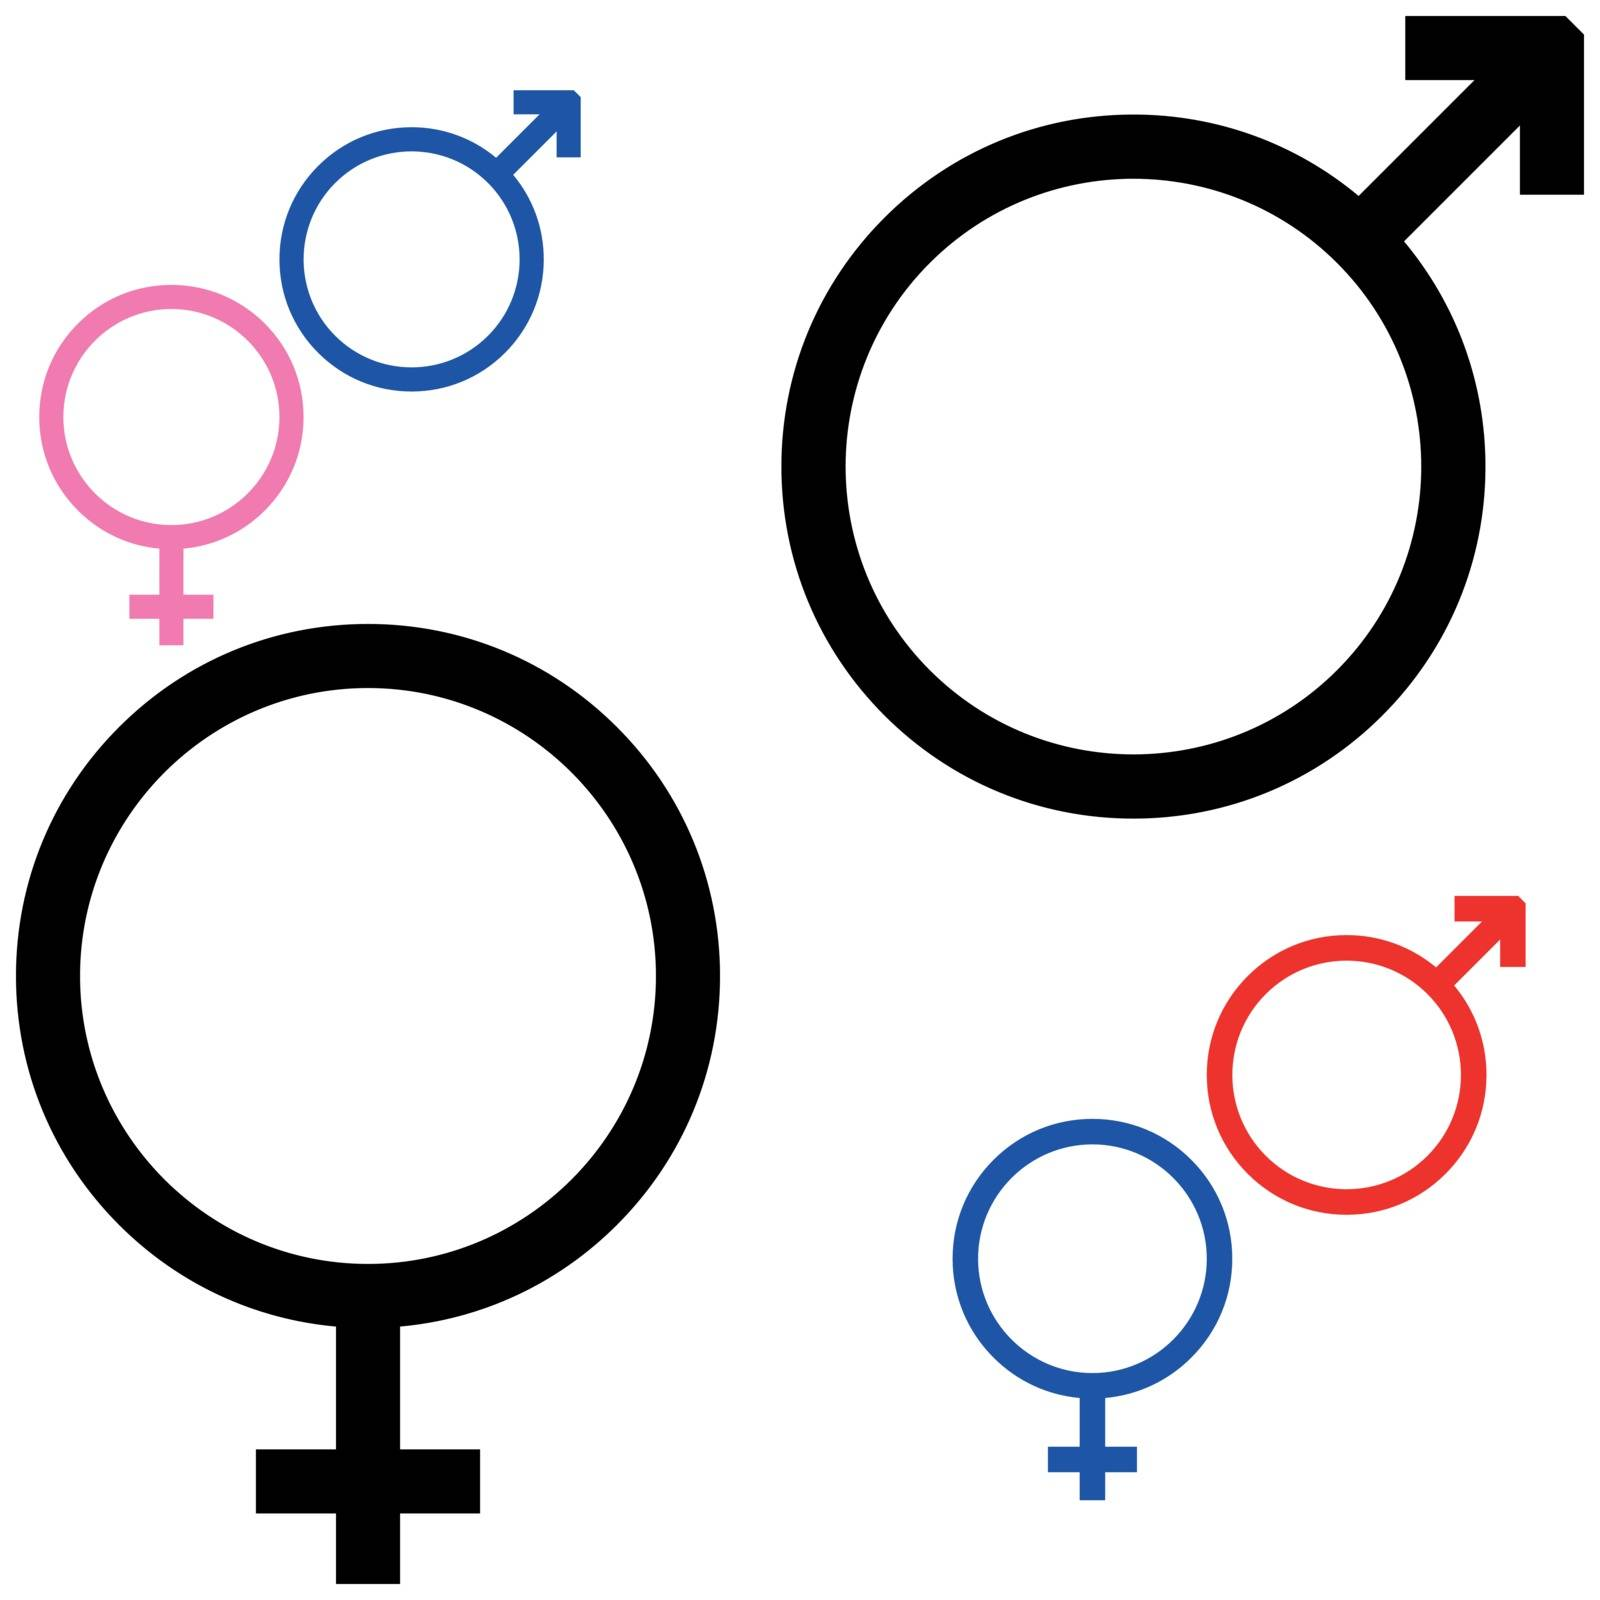 Symbol of gender, symbol Mars and Venus it is set.